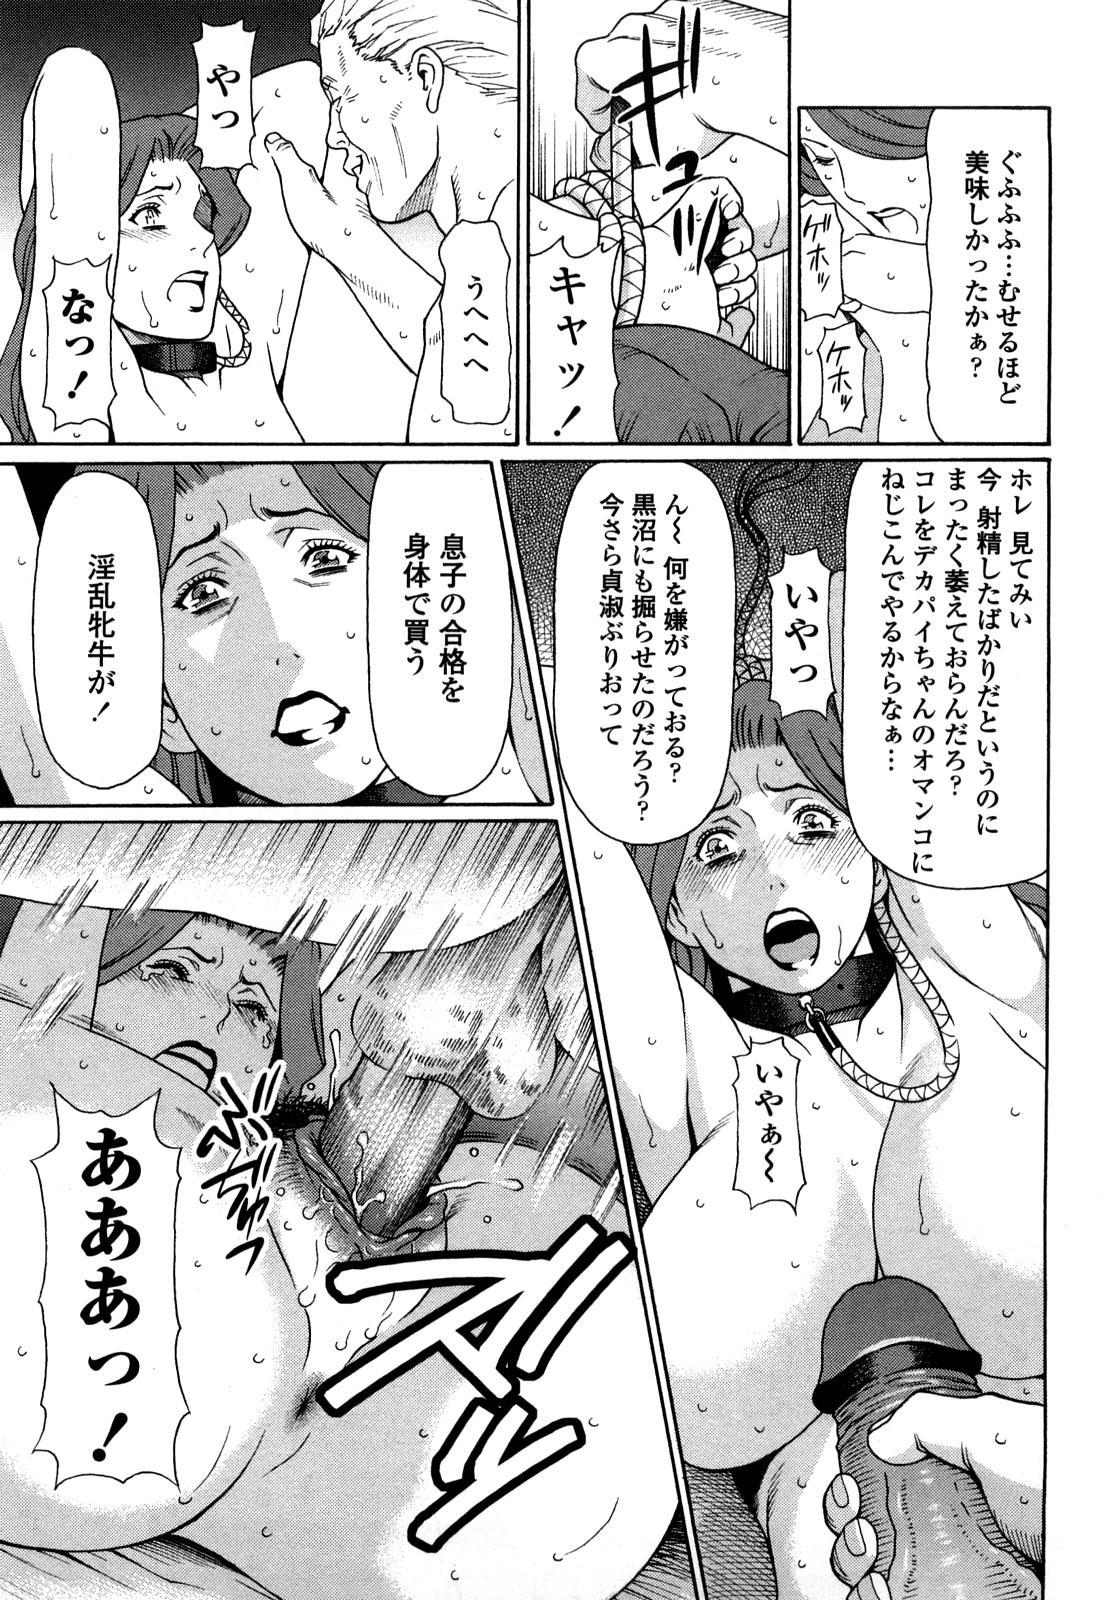 [Takasugi Kou] Kindan no Haha-Ana - Immorality Love-Hole [Decensored] 98